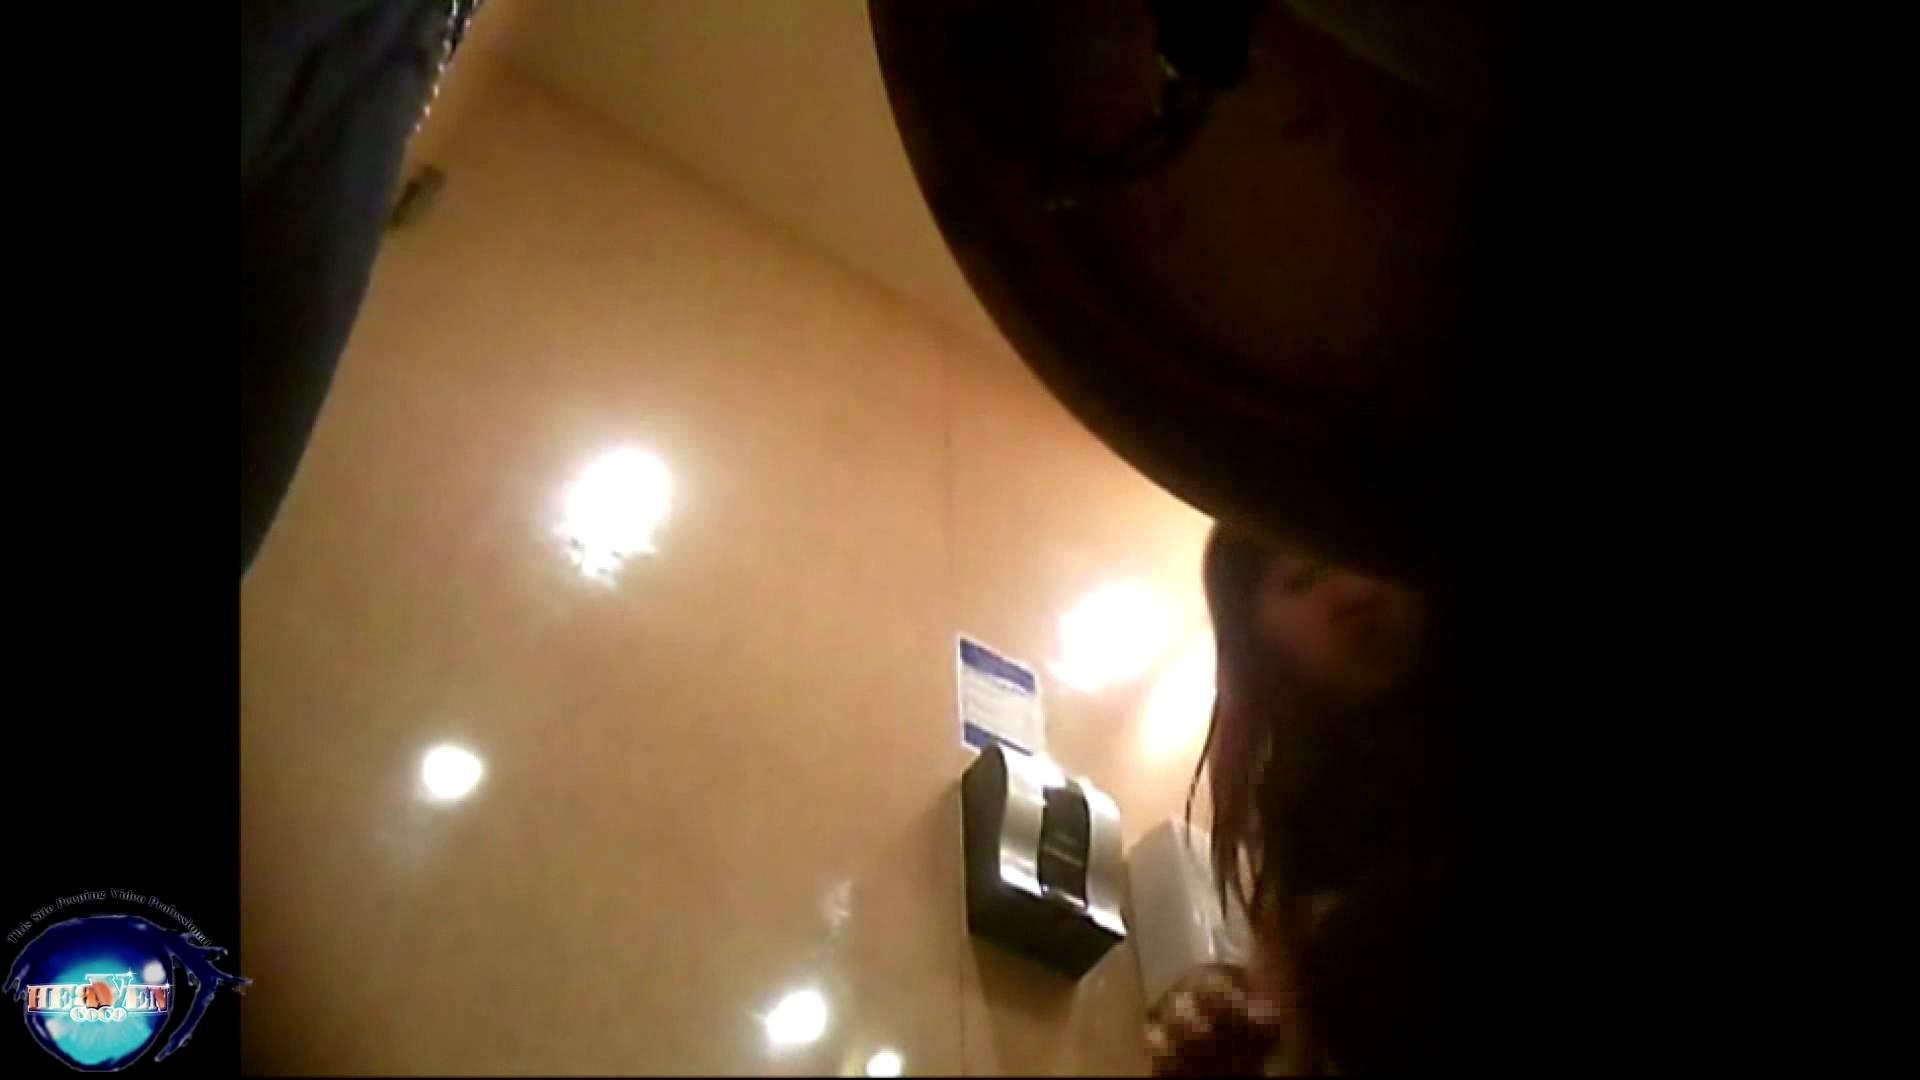 突撃!女子化粧室の真実vol.04 盗撮師作品 オマンコ無修正動画無料 80pic 23